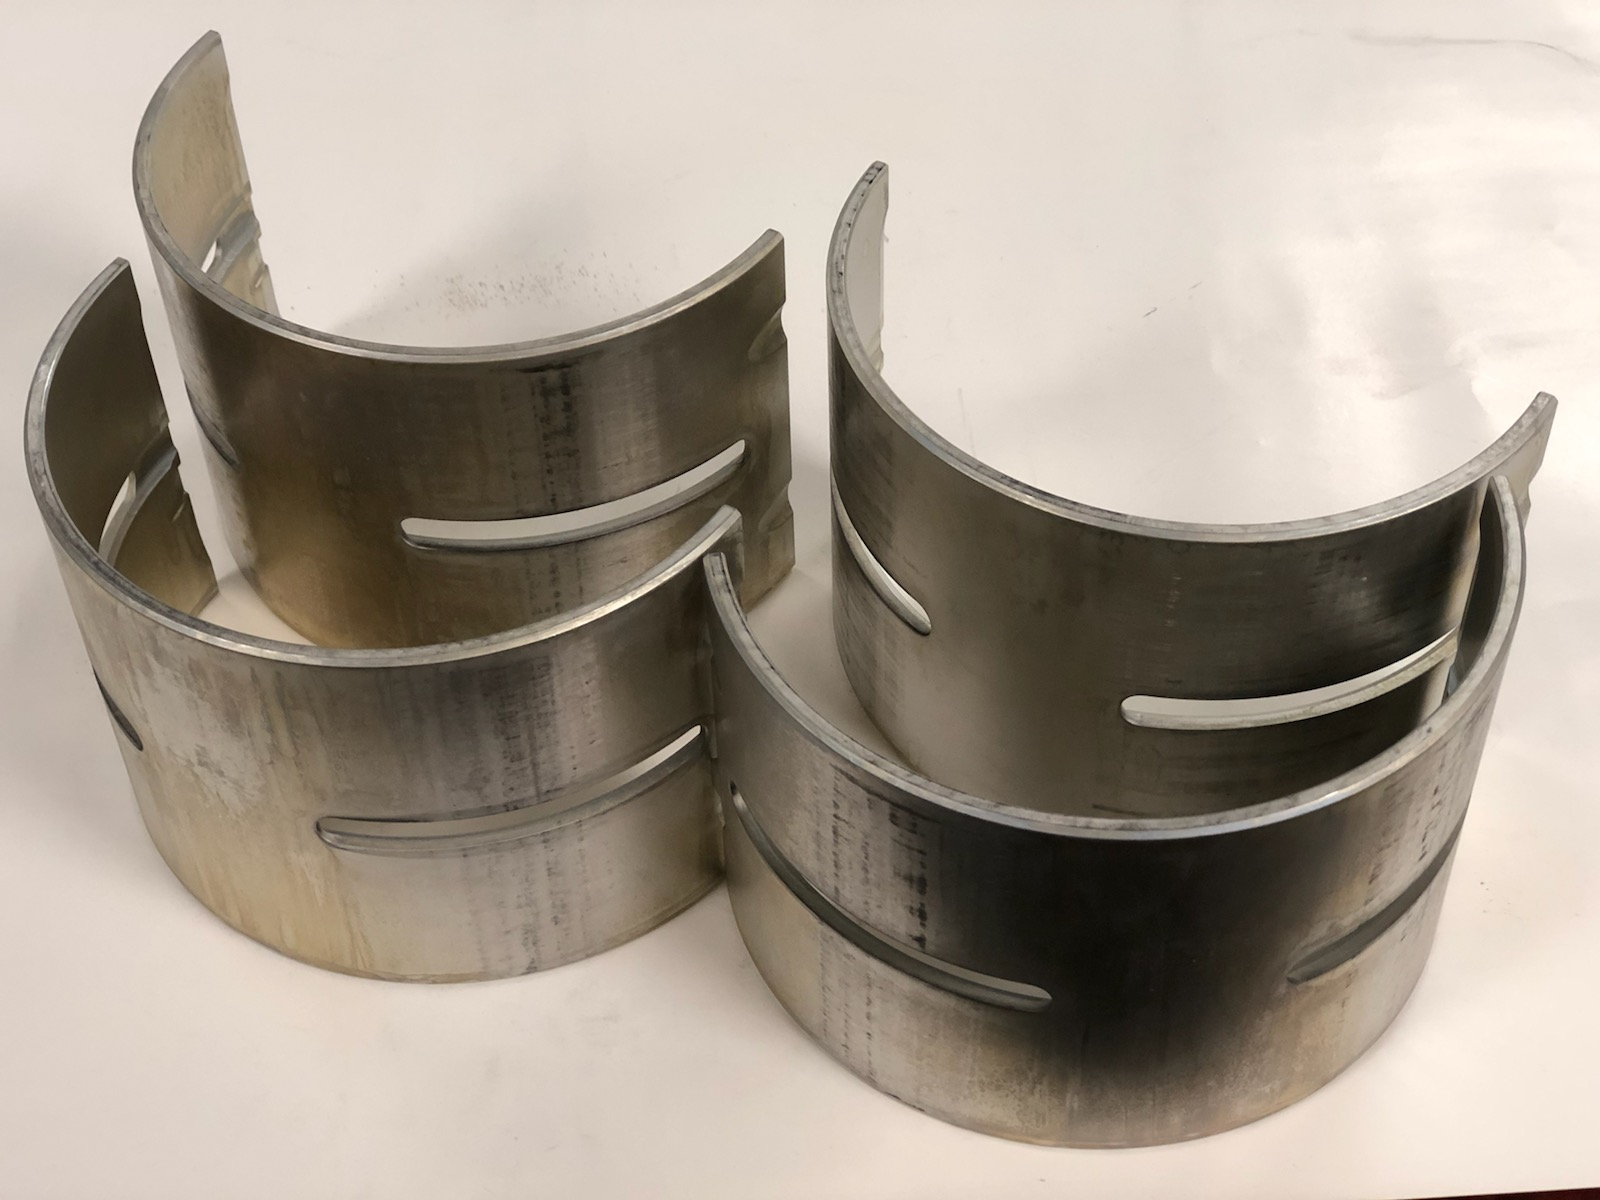 117x1045-2 Crankshaft Bearing for GE 7FDL Engine